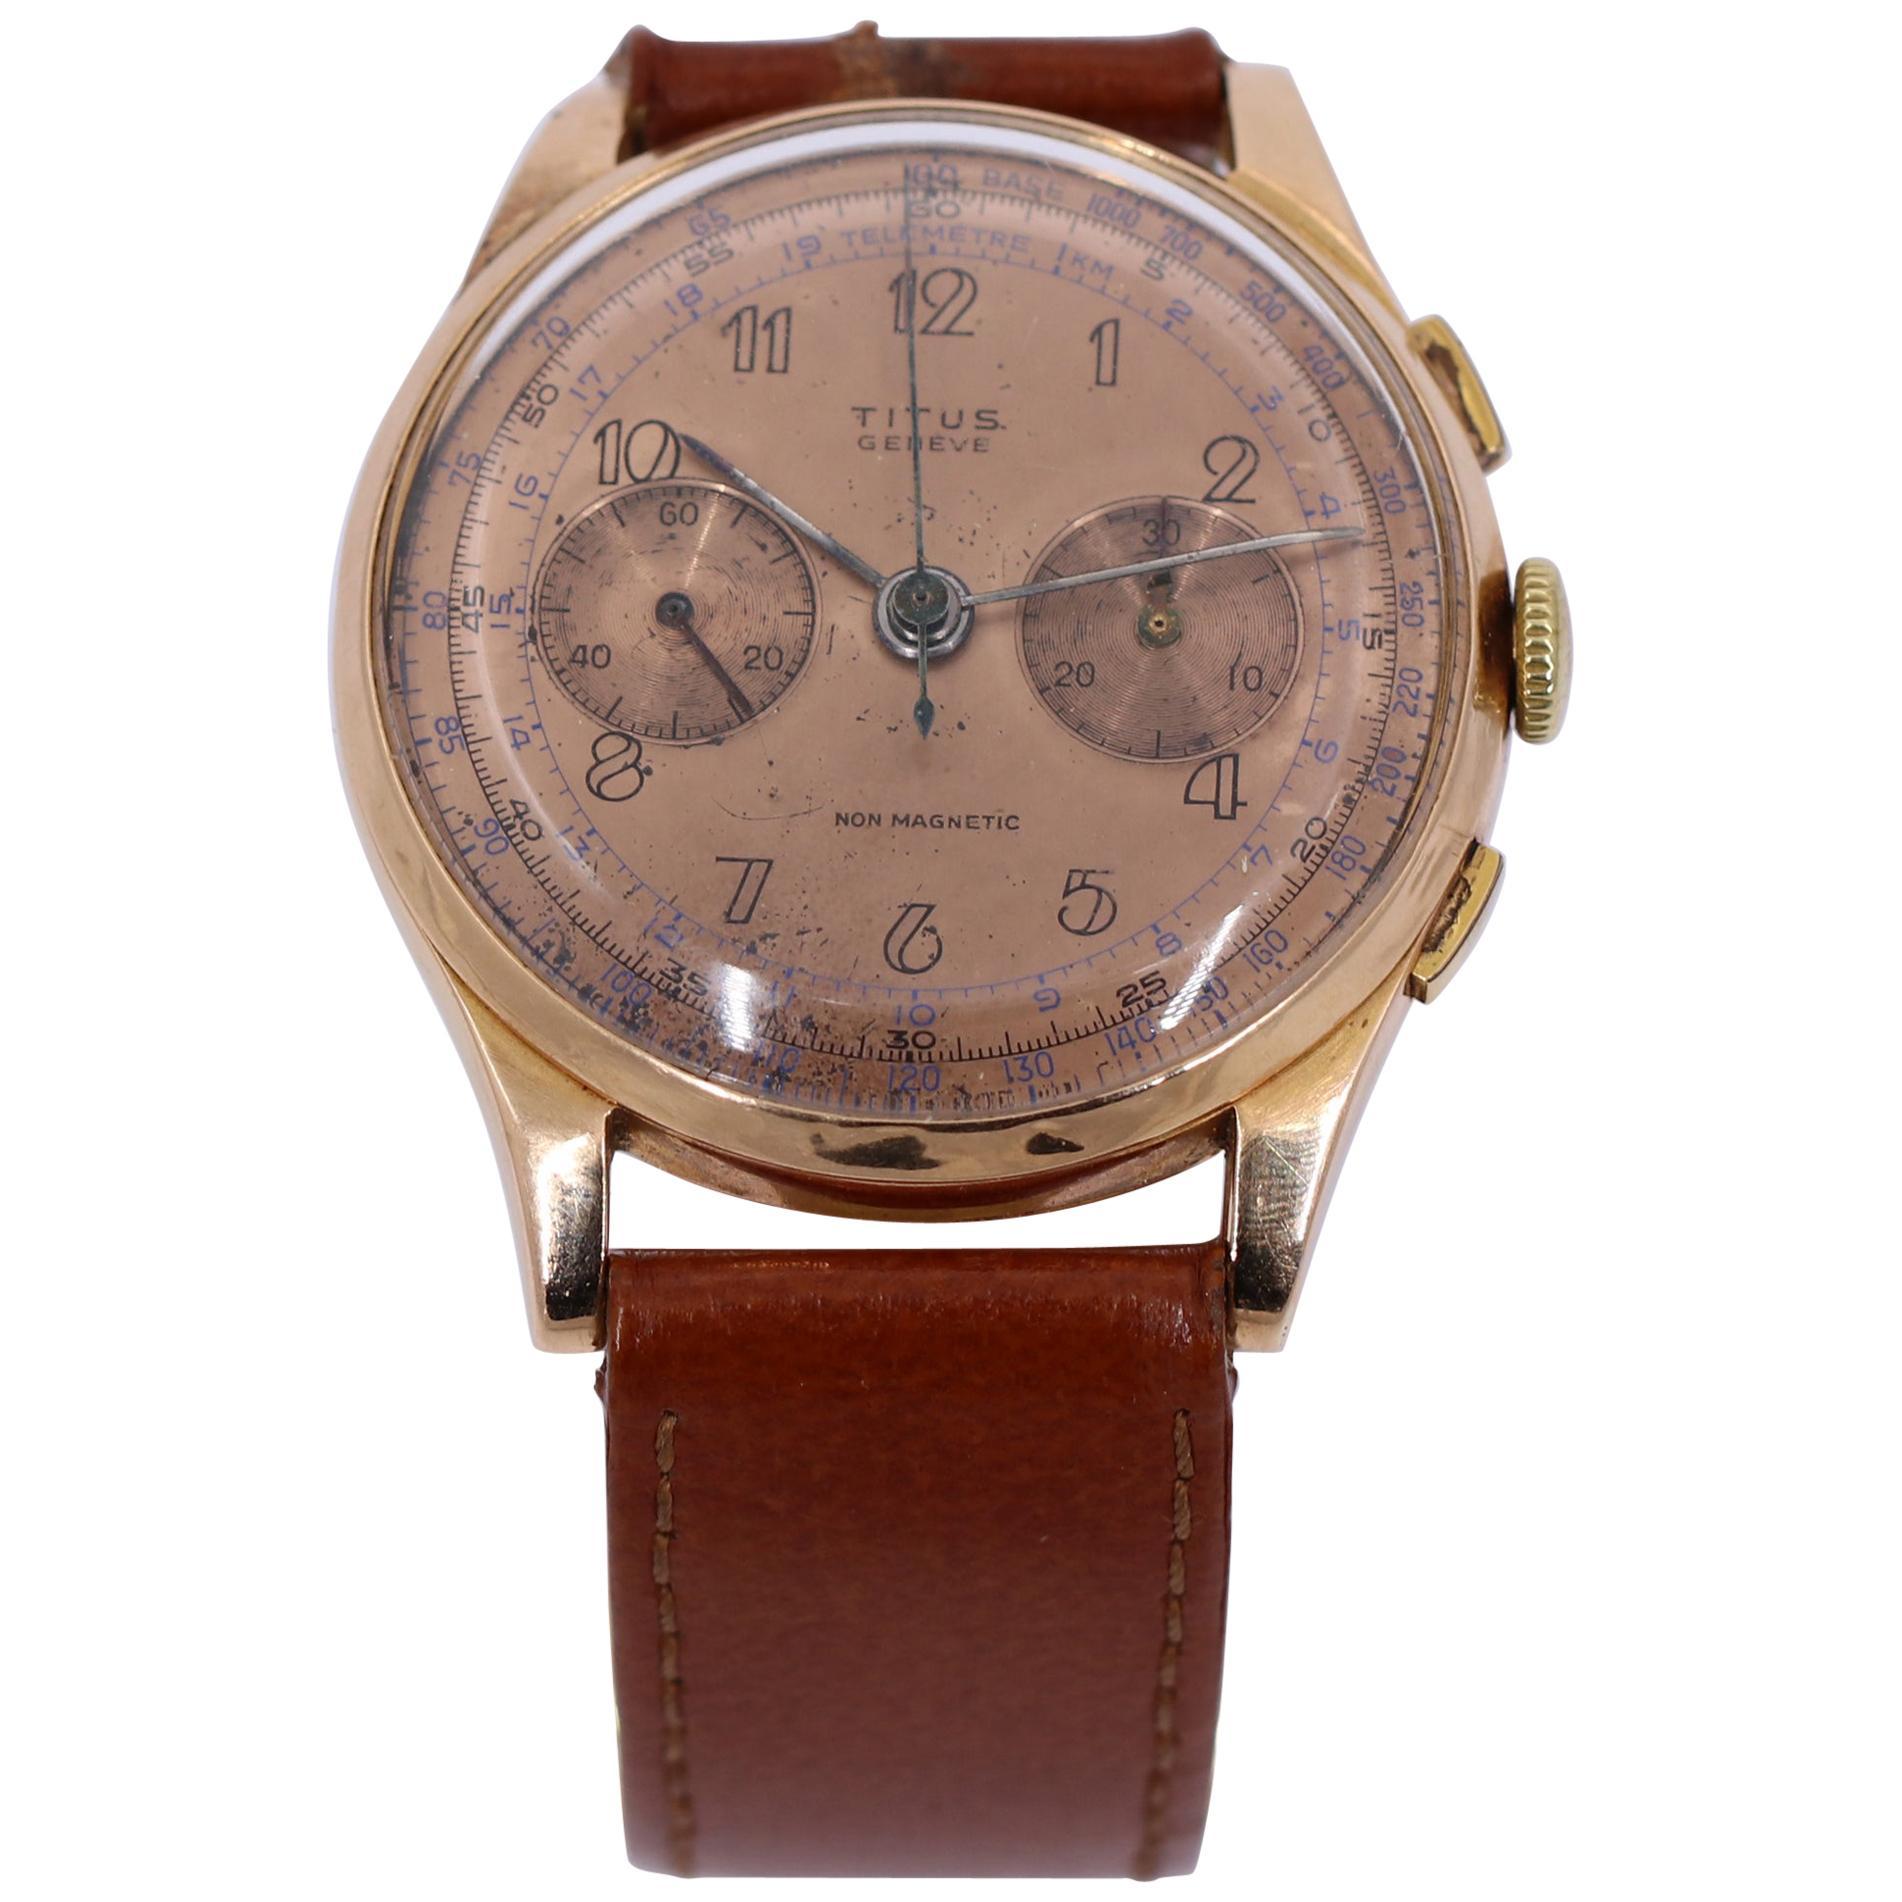 Vintage Titus Rose Gold Chronograph Watch